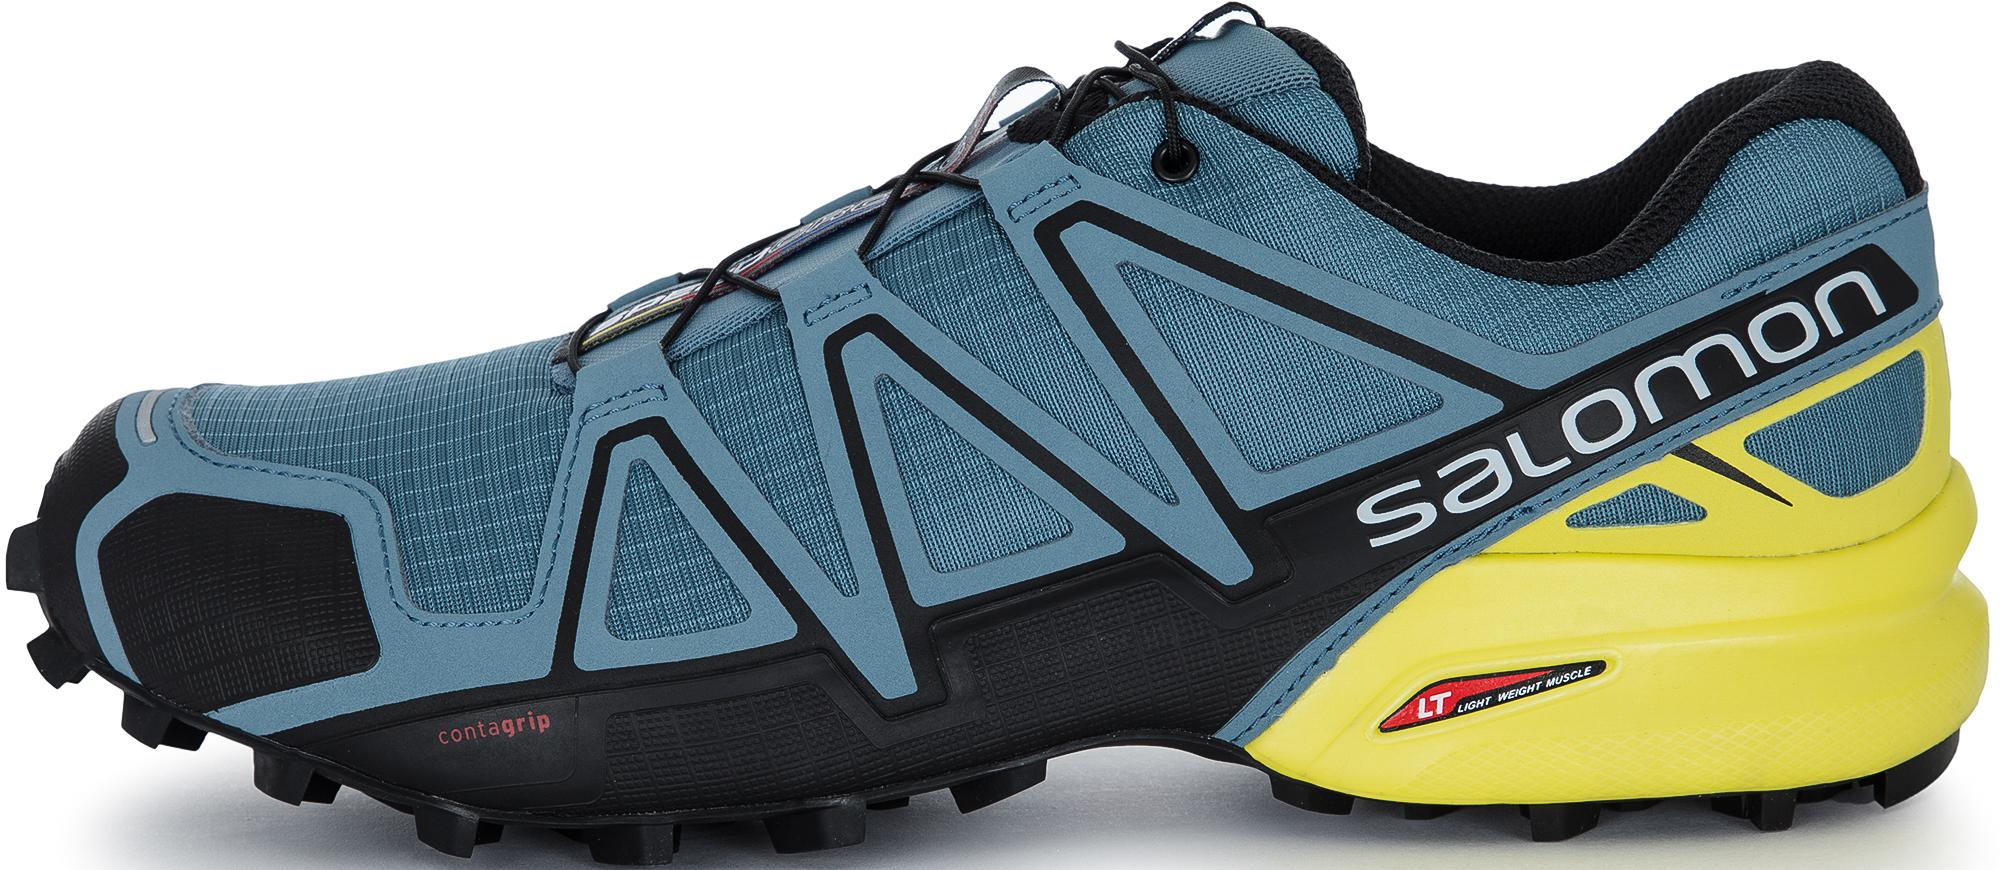 Salomon Кроссовки мужские Salomon Speedcross 4, размер 42 цена